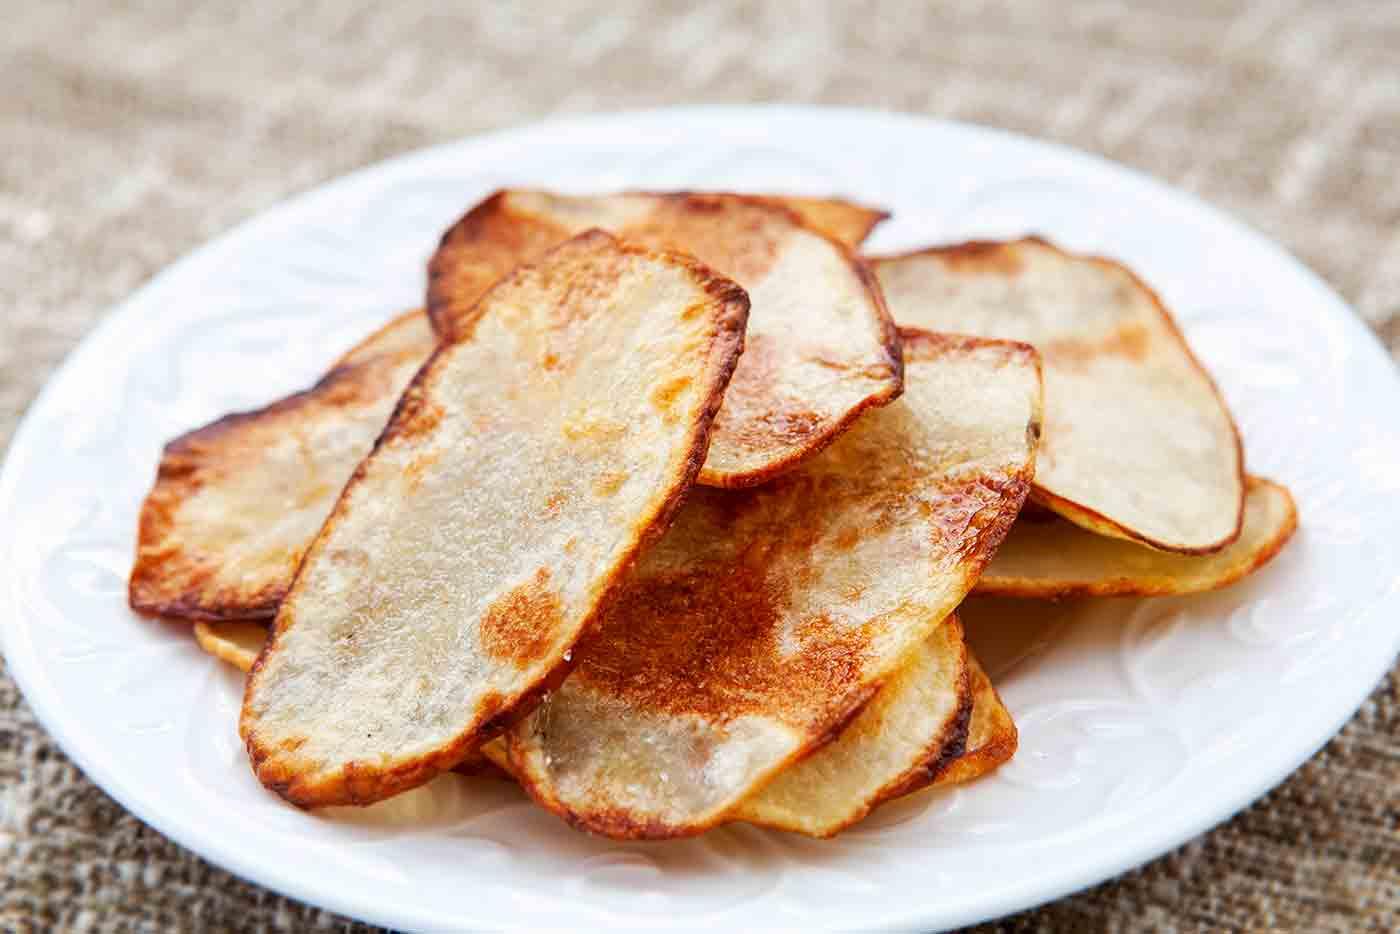 Oven-fried Potato Chips